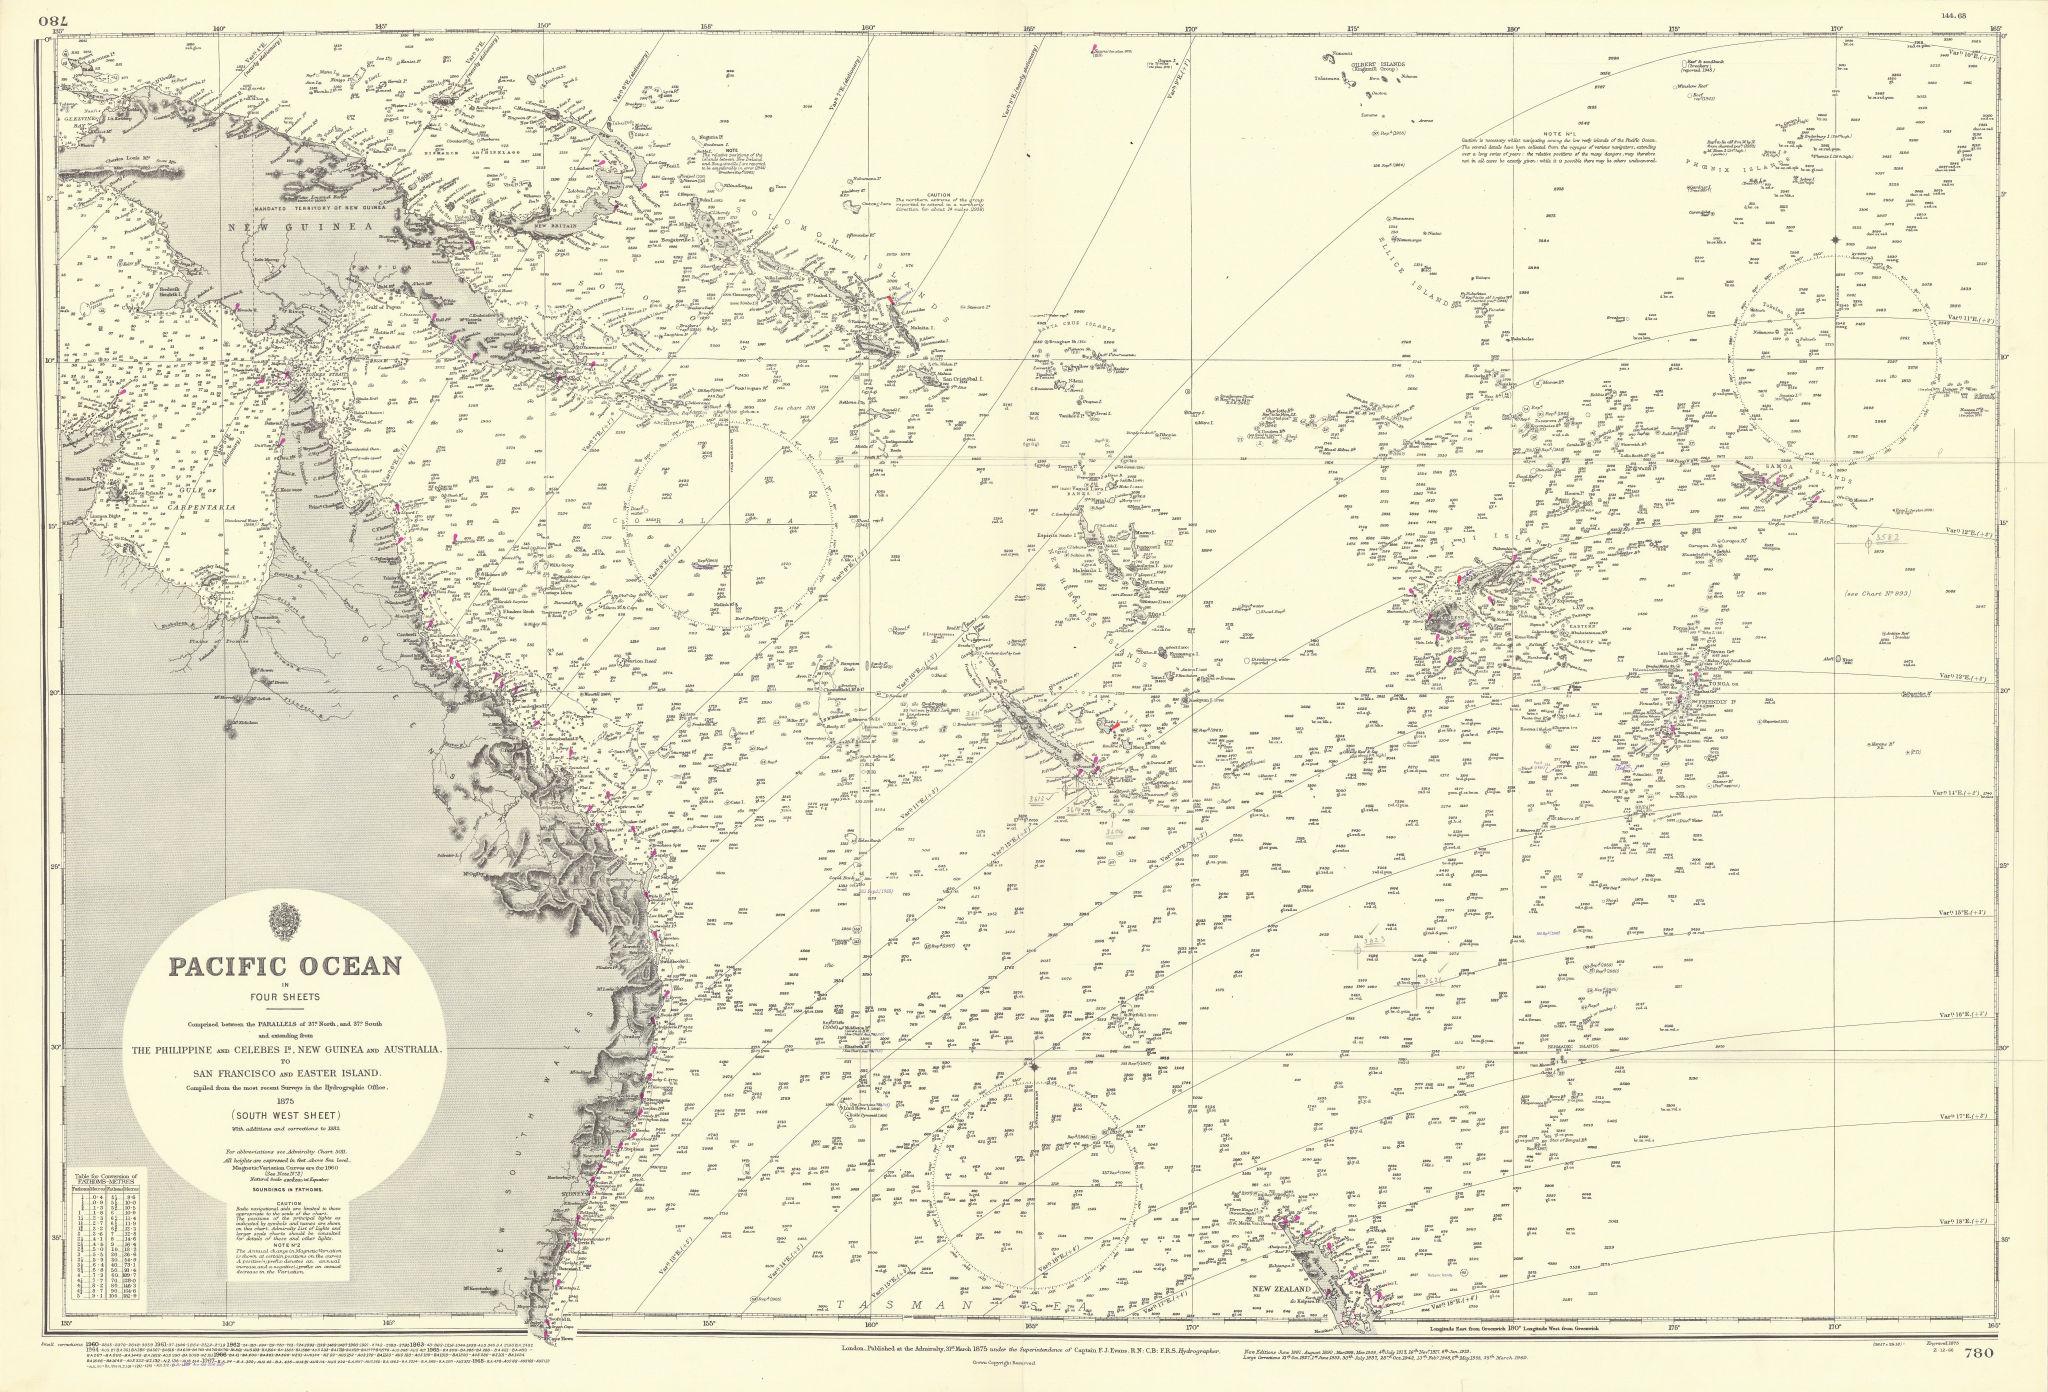 South west Pacific Ocean Melanesia Polynesia ADMIRALTY sea chart 1875 (1968) map